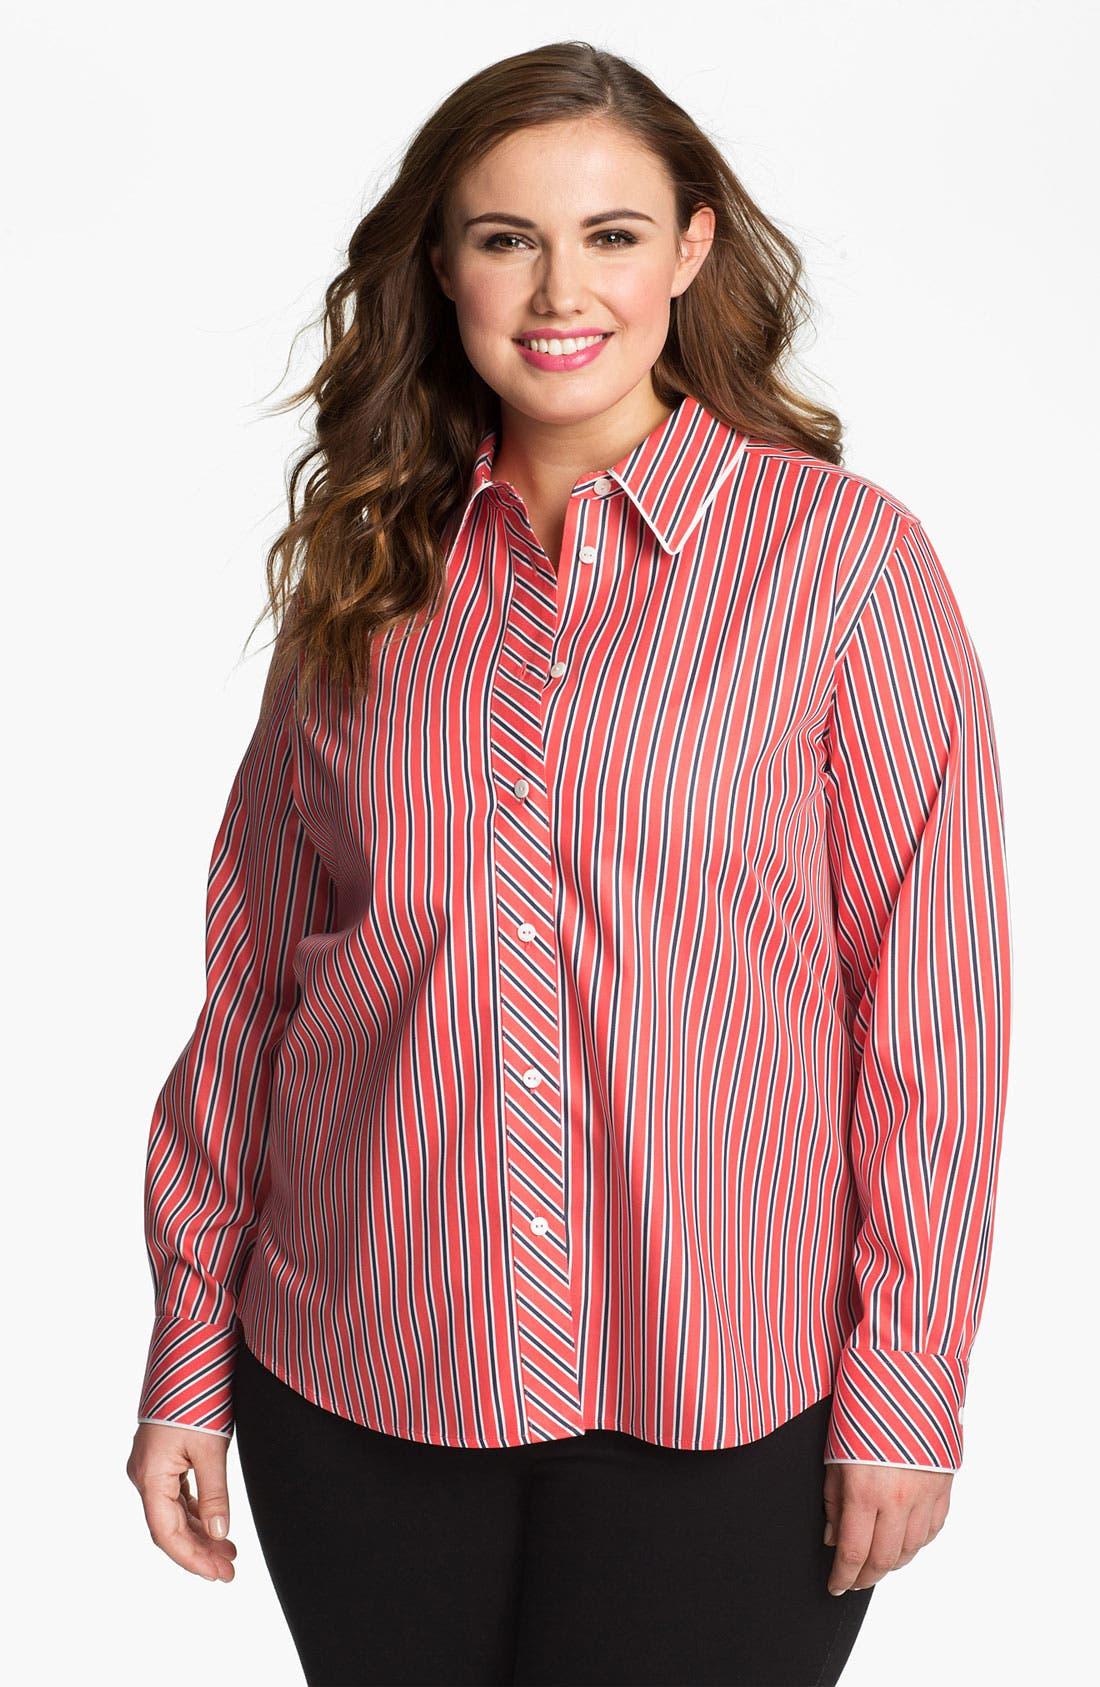 Alternate Image 1 Selected - Foxcroft 'Papaya' Stripe Shaped Cotton Shirt (Plus Size)